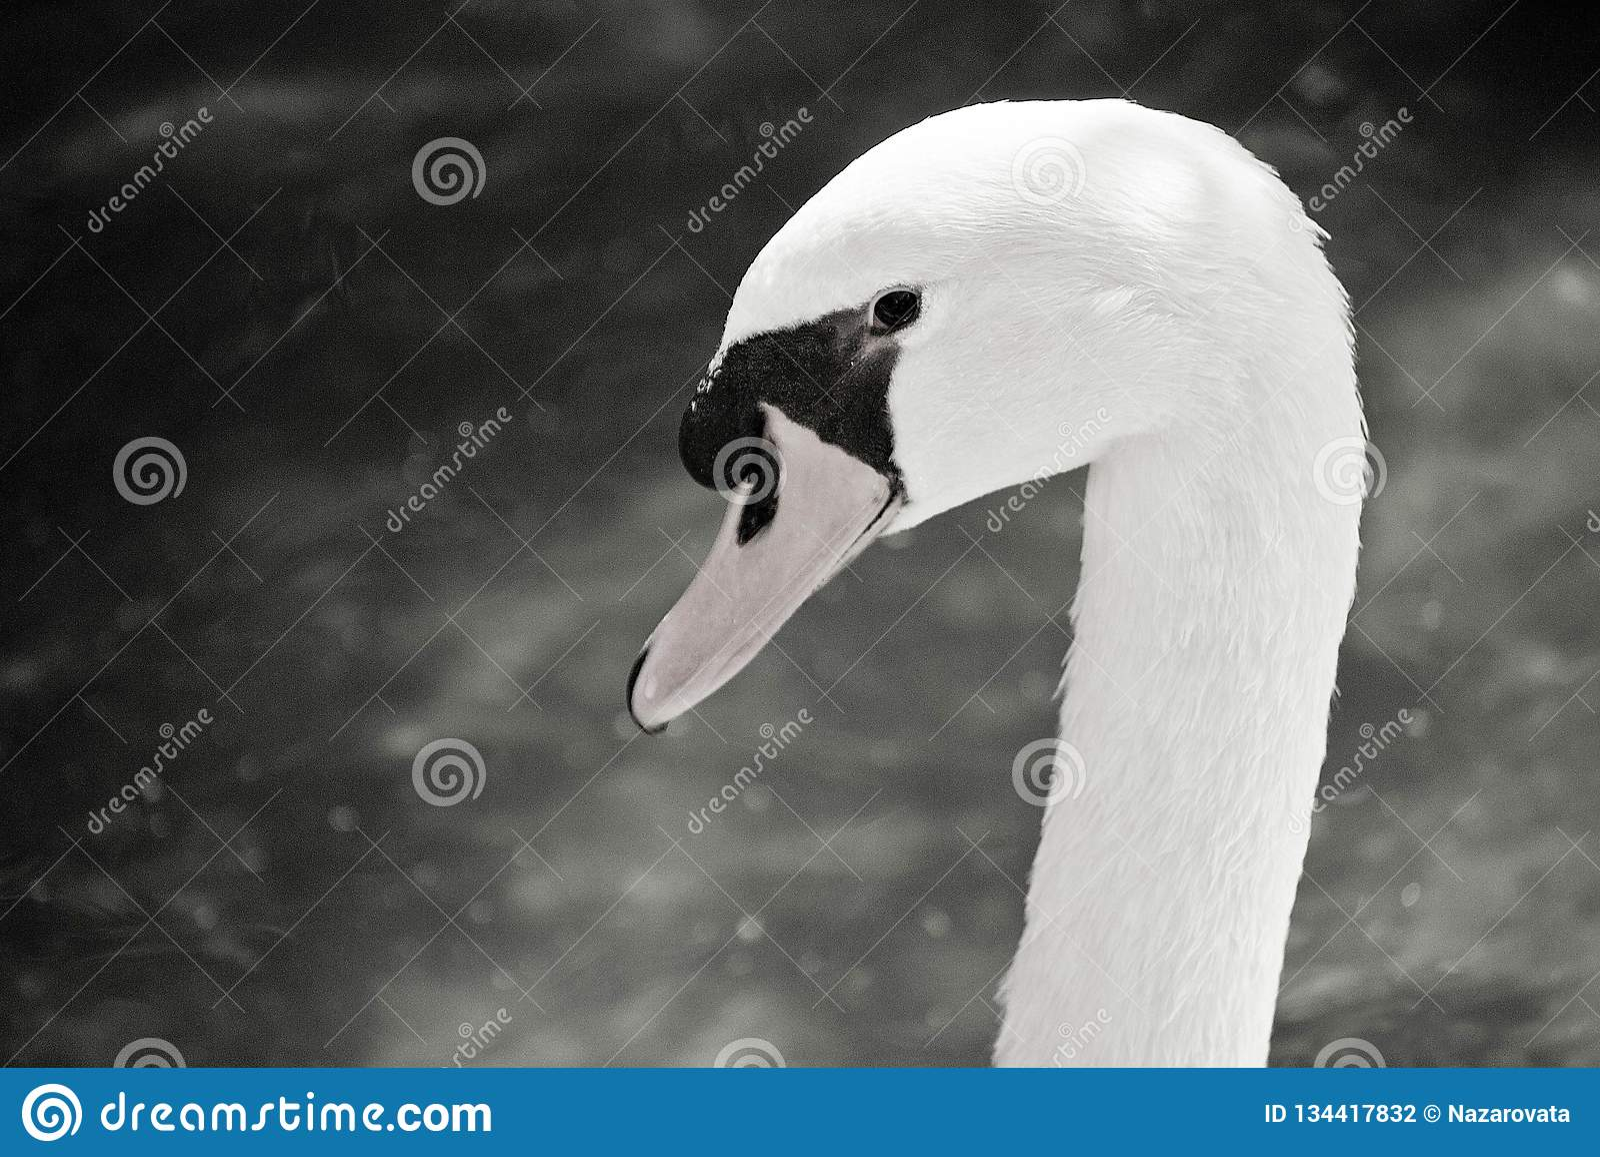 Swan head black and white photo